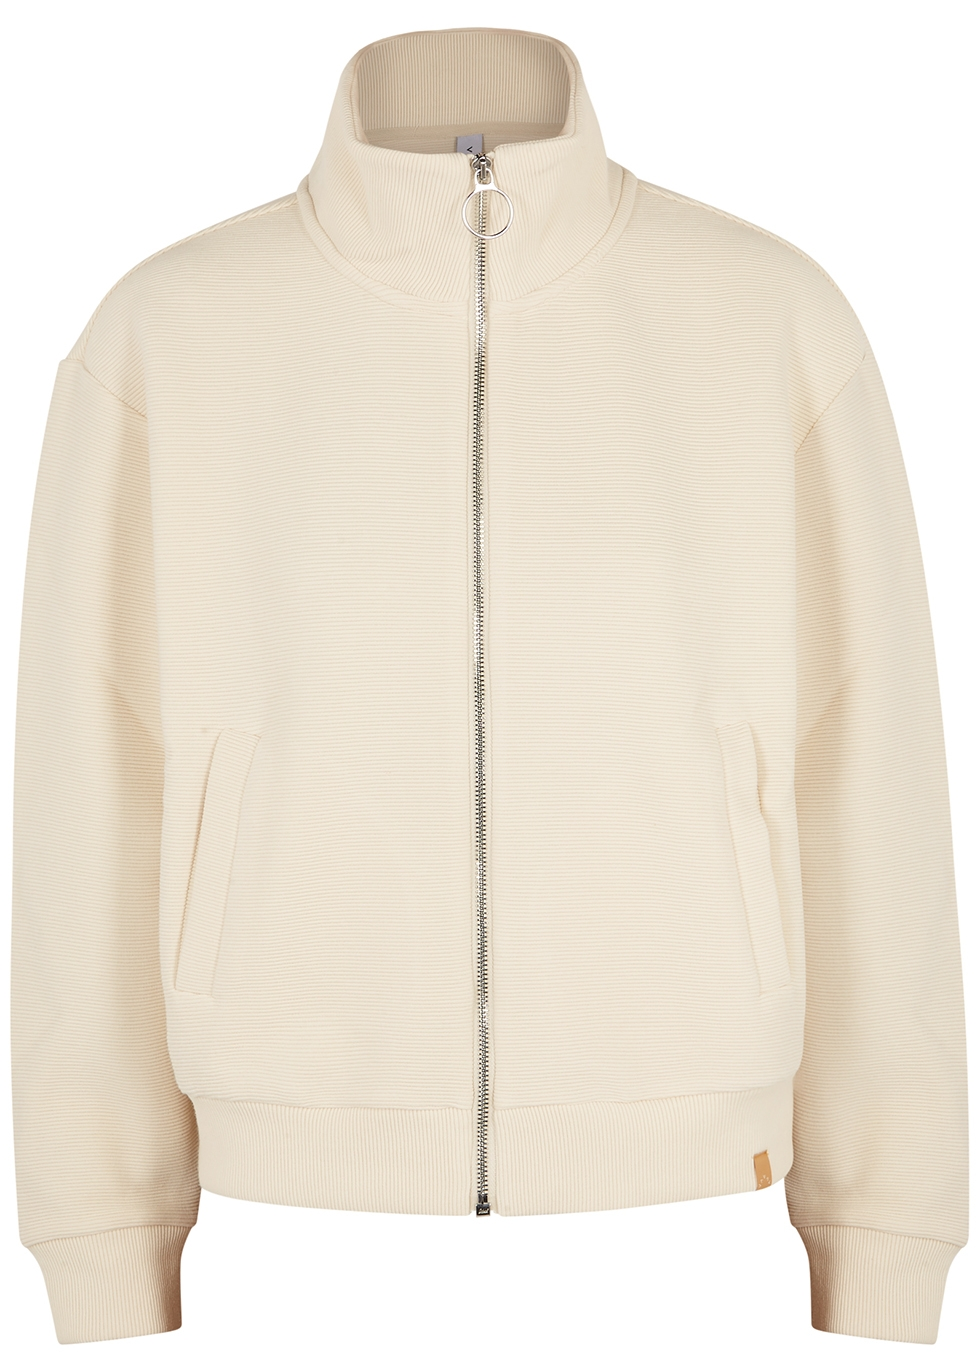 Bloomwood ecru stretch-jersey track jacket